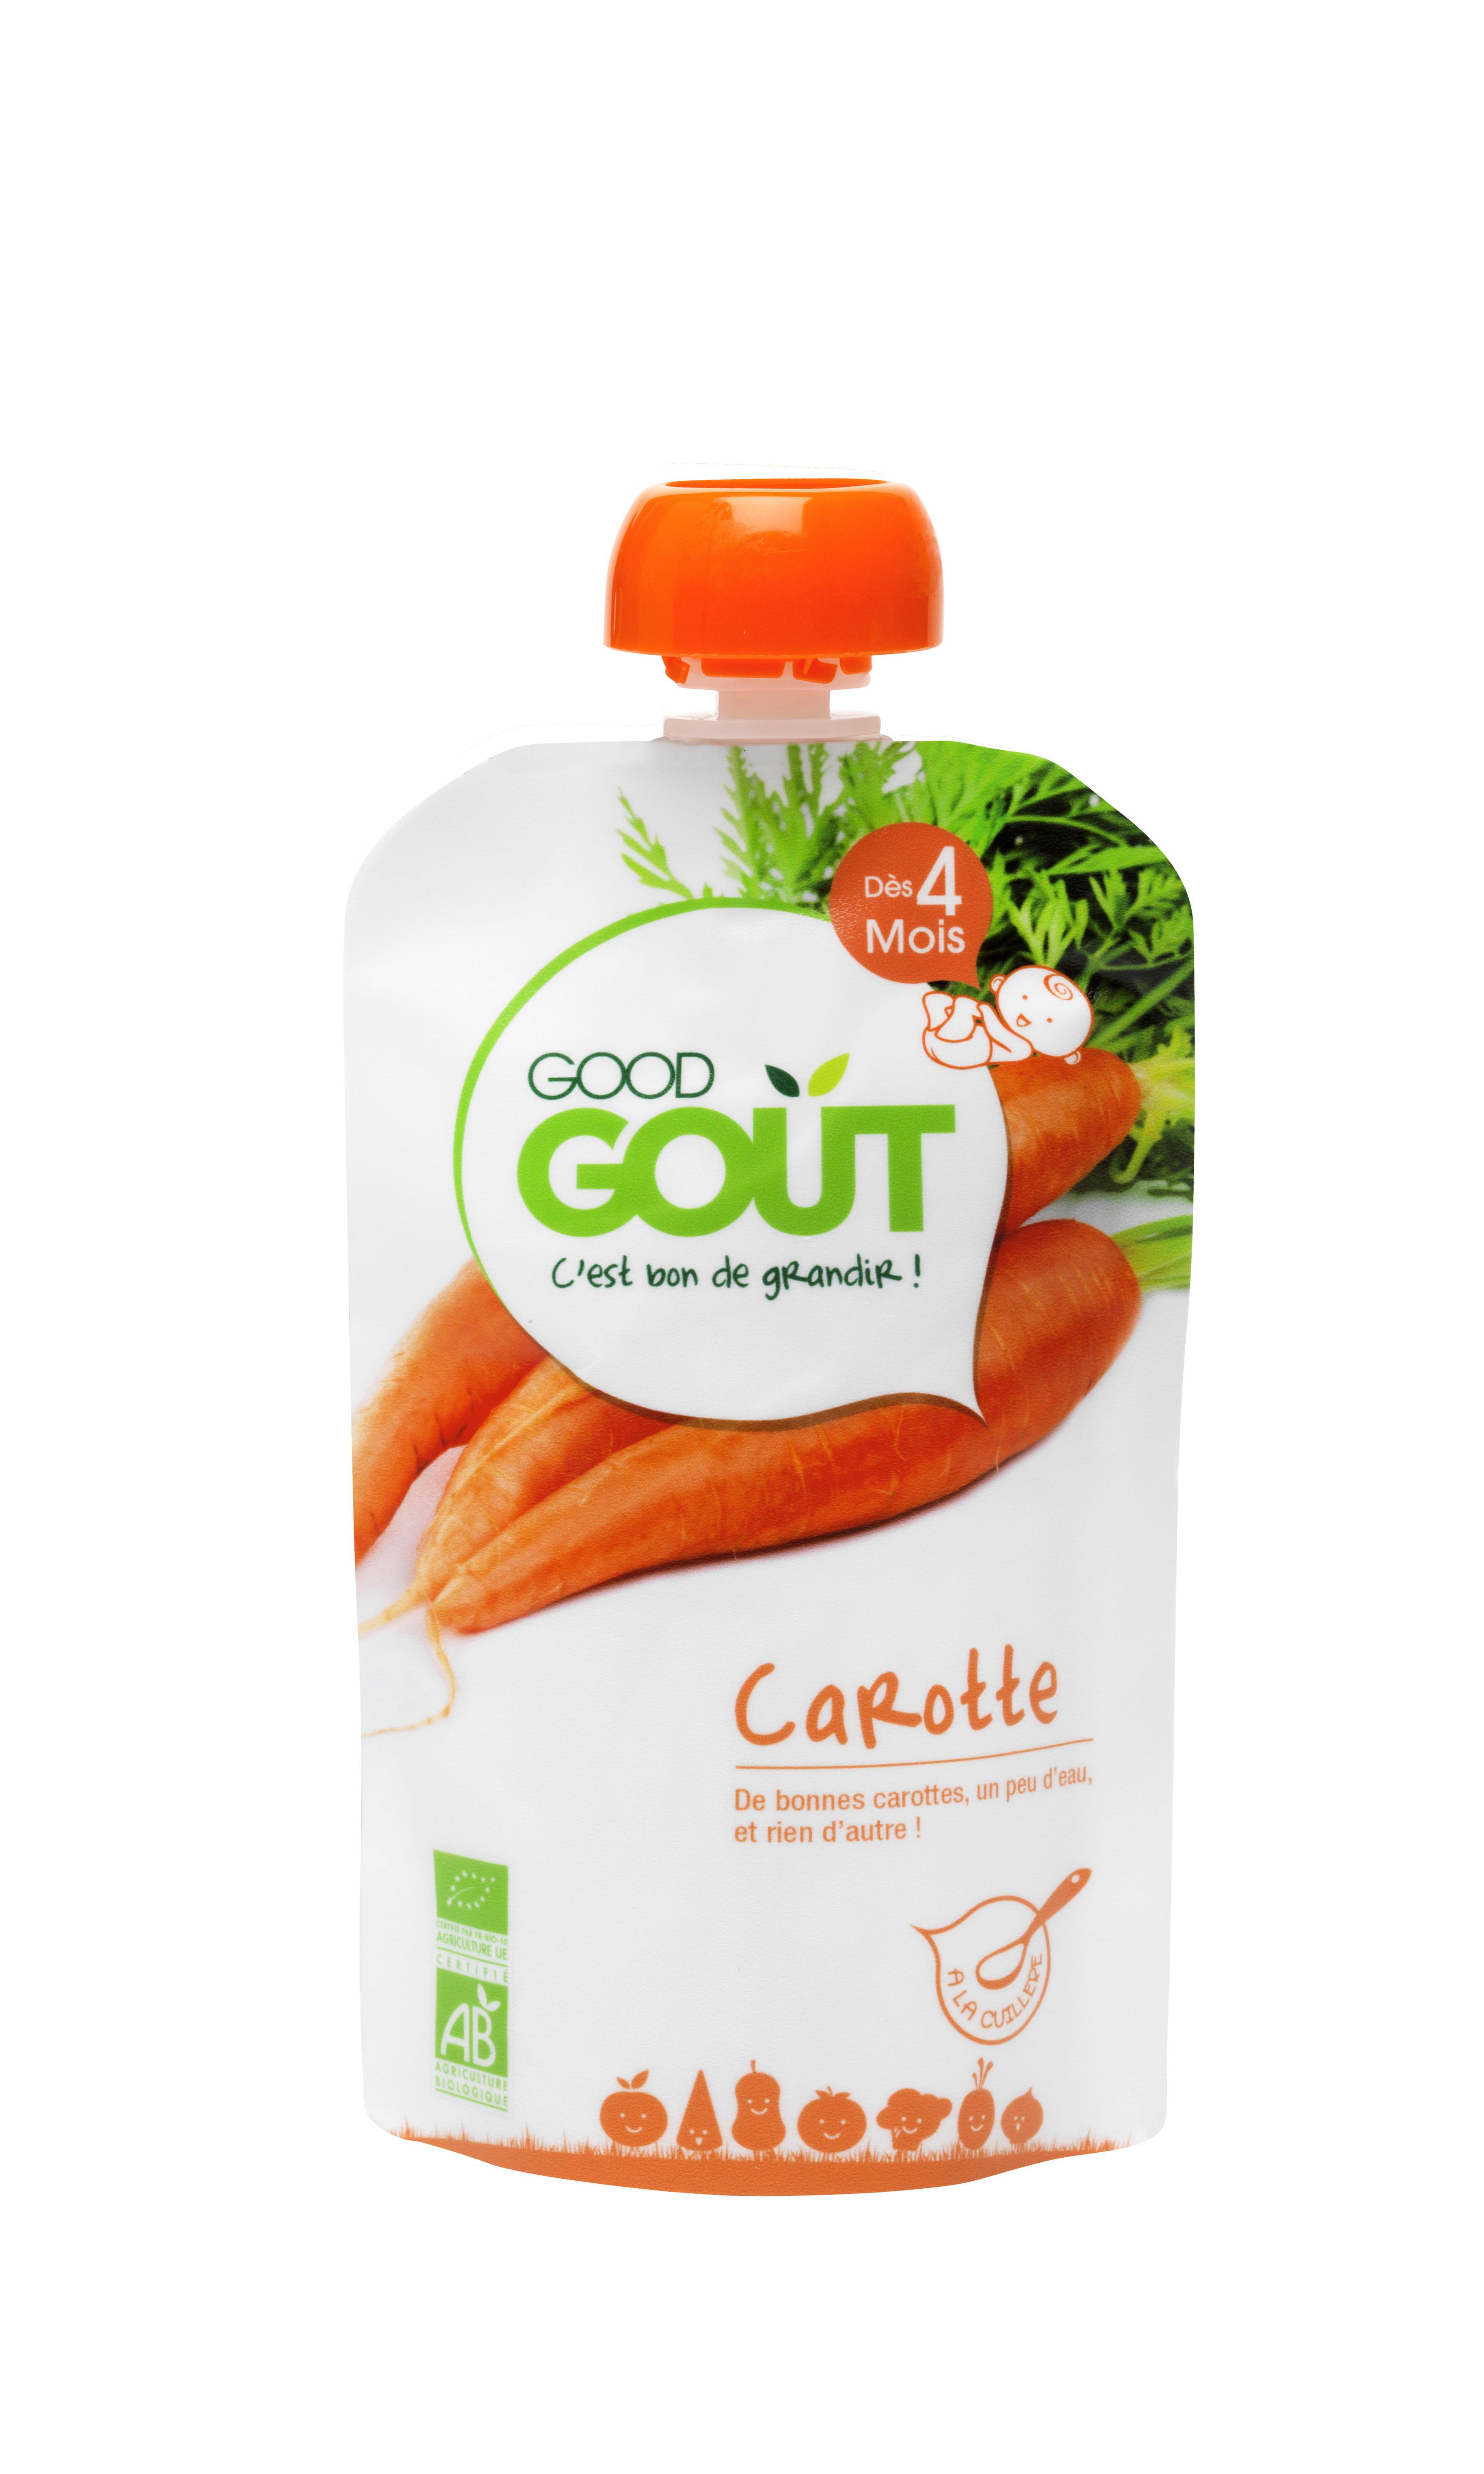 Good Gourde Carotte BIO, Good Goût (120 g) - dès 4 mois